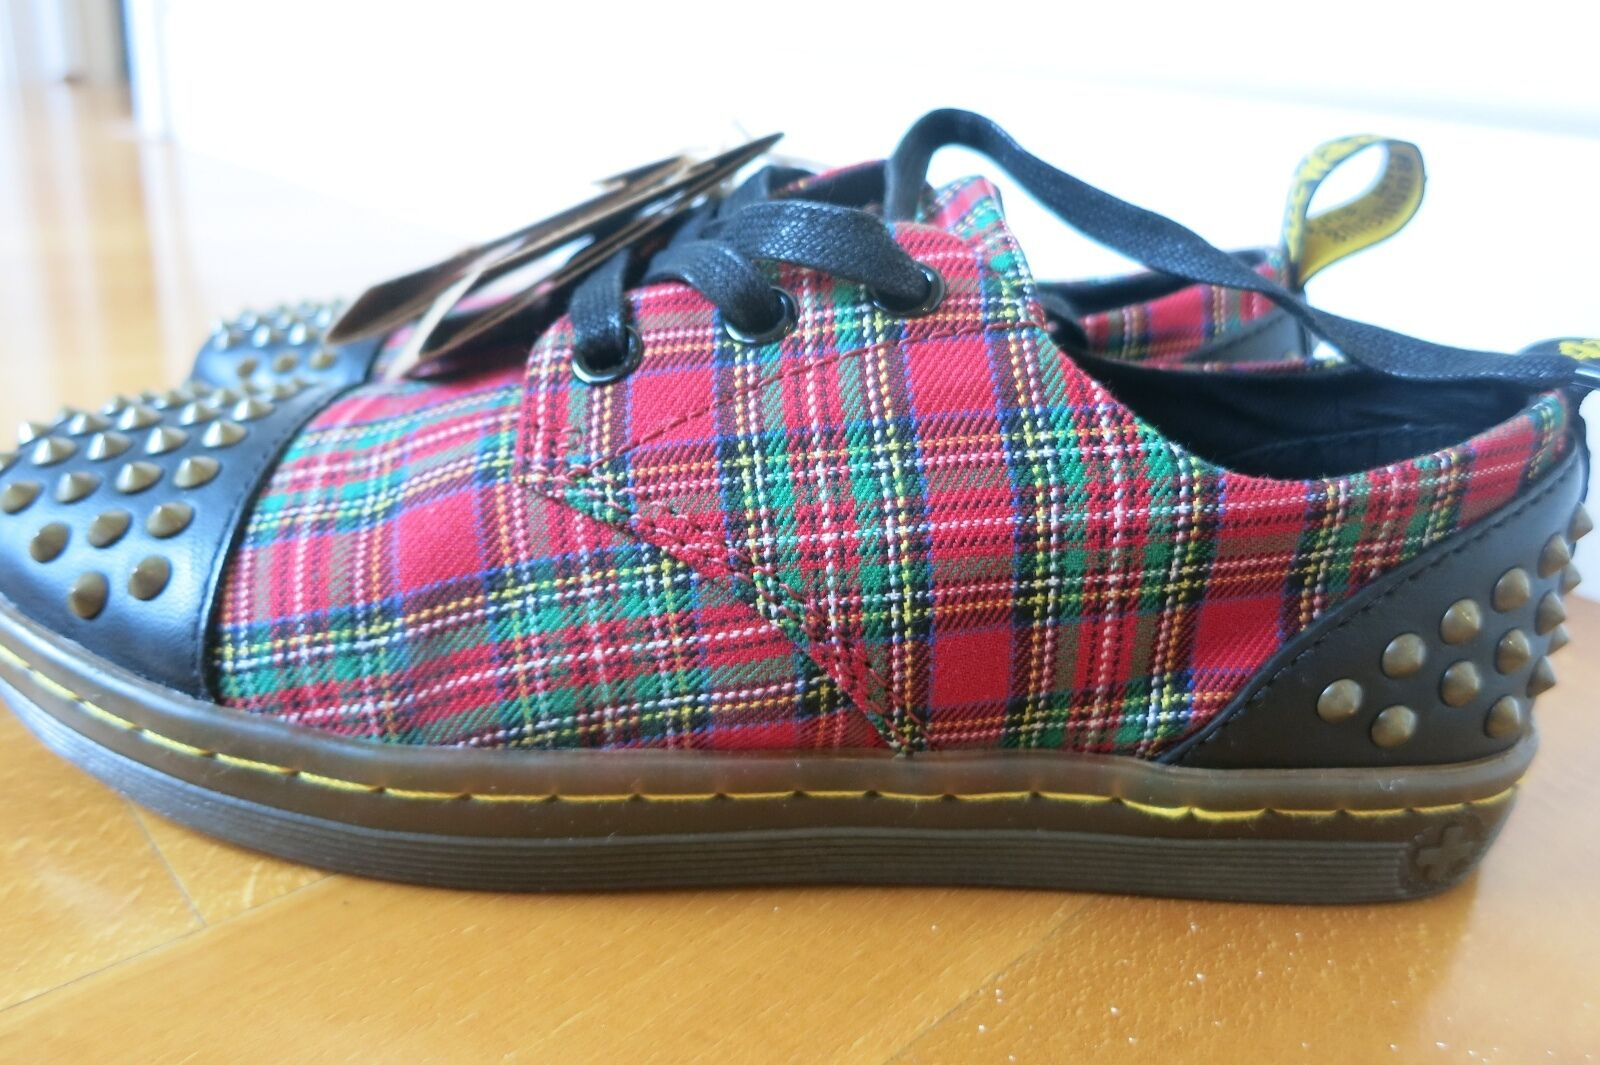 grandi offerte NEW Doc Dr. Martens Donna Donna Donna  Aldstud scarpe da ginnastica donna US 5 Plaid Canvas  rivenditori online